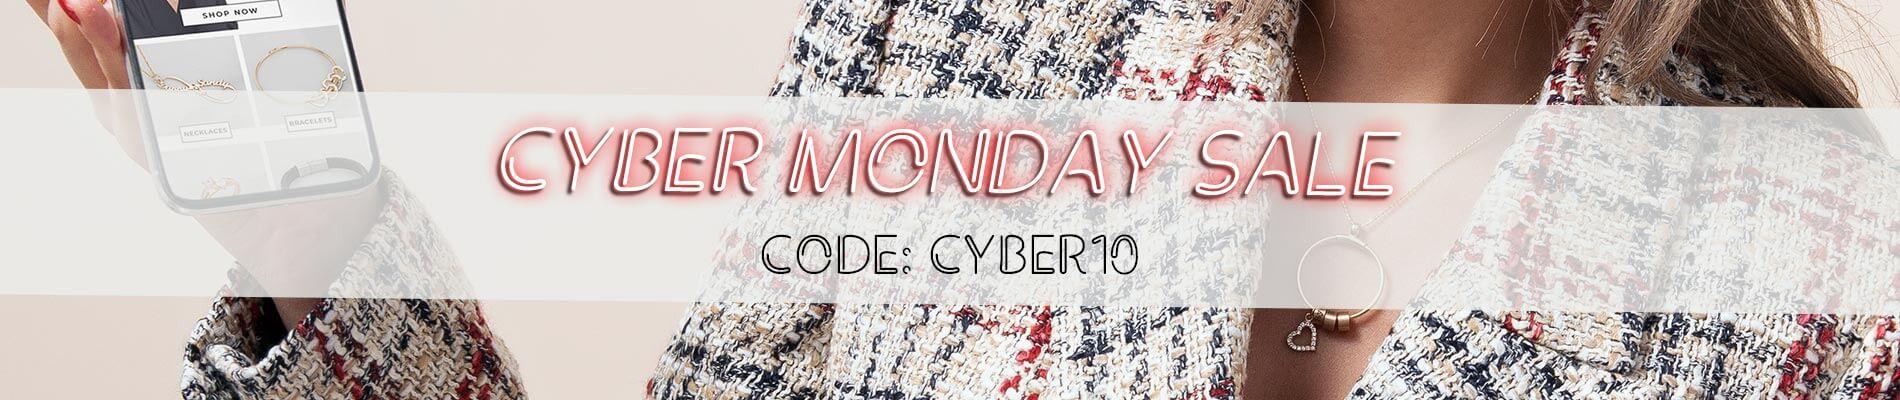 Cyber Monday 28/11 top banner desktop